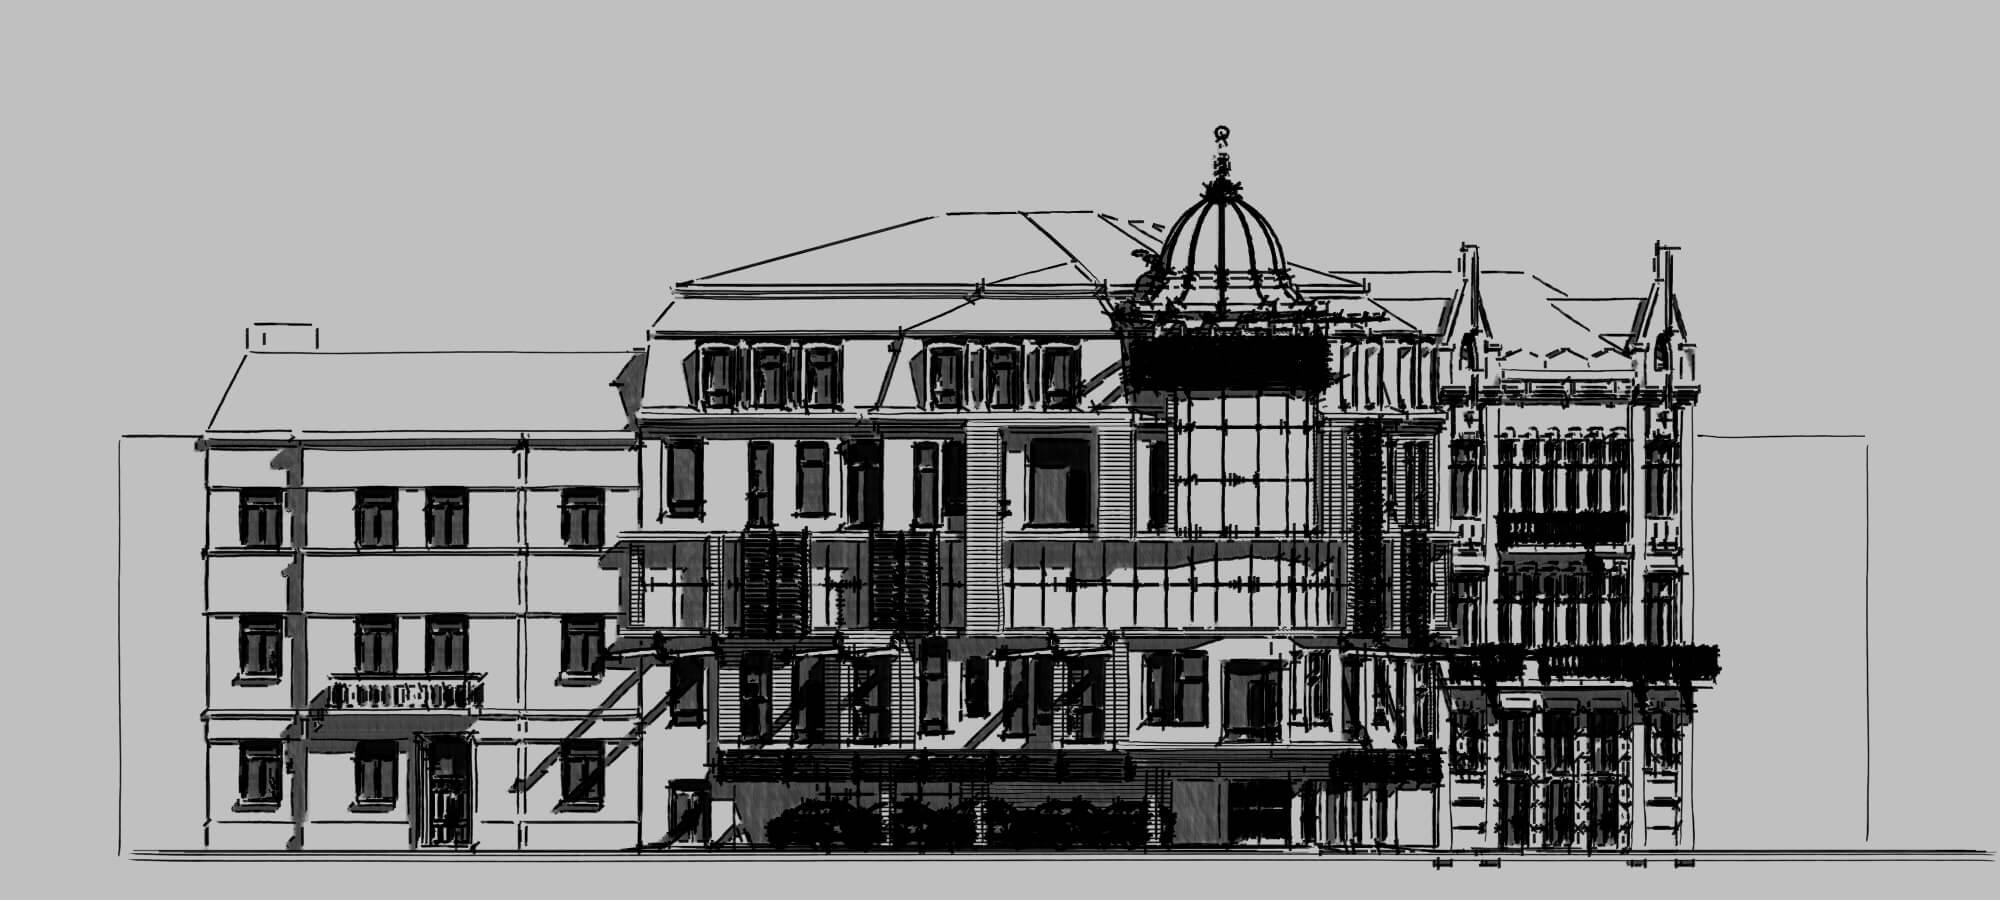 Каскад-Будинвест: проекты компании (изображение 13)